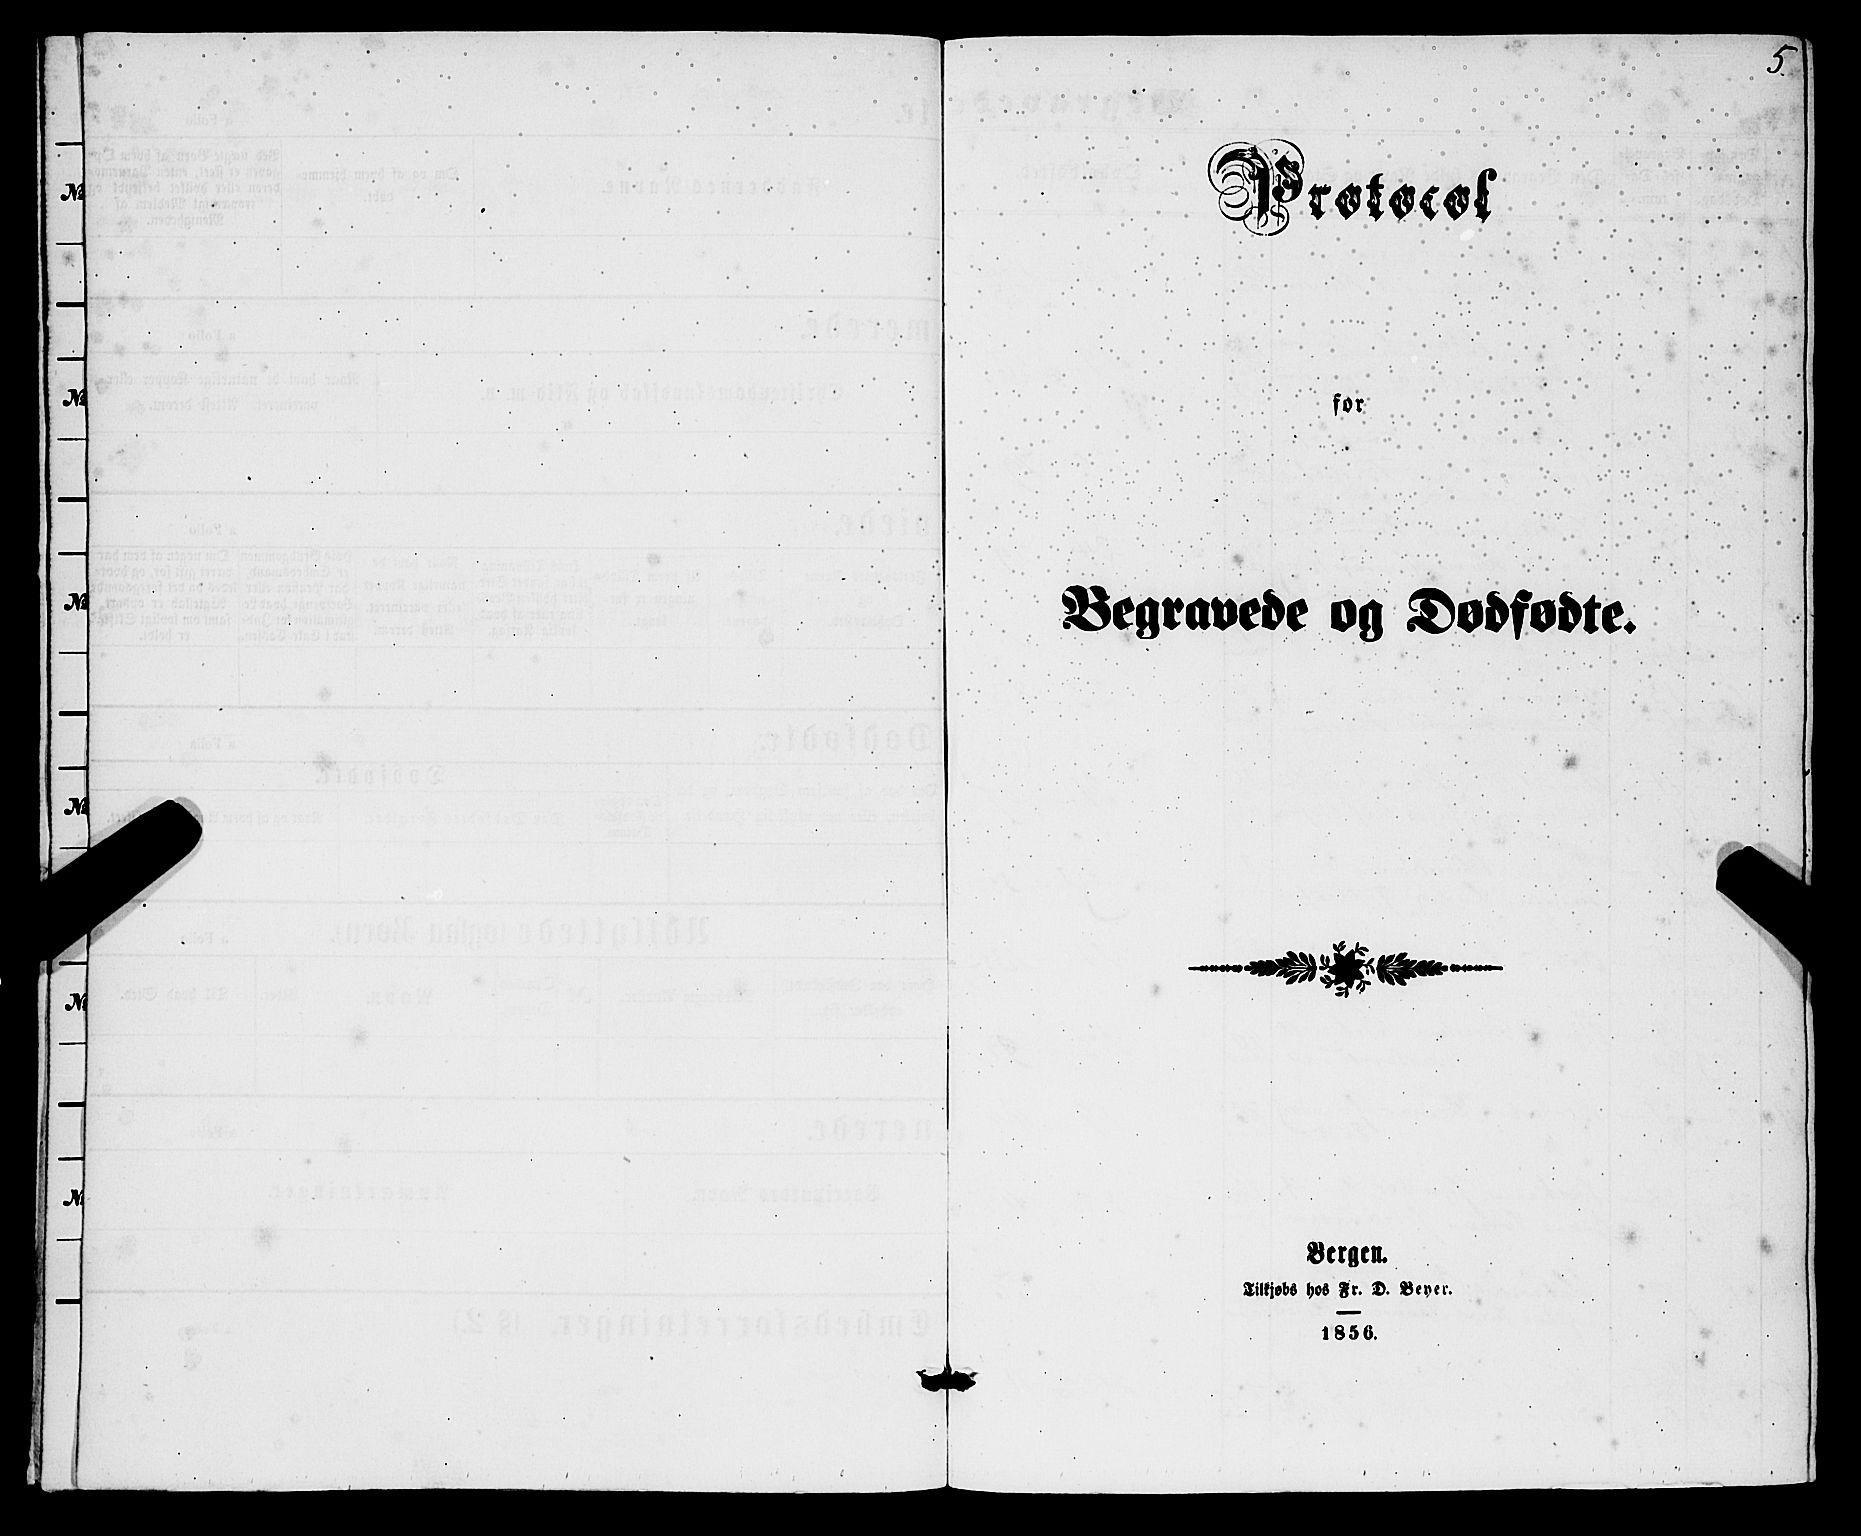 SAB, Korskirken Sokneprestembete, H/Haa/L0045: Ministerialbok nr. E 3, 1863-1875, s. 5